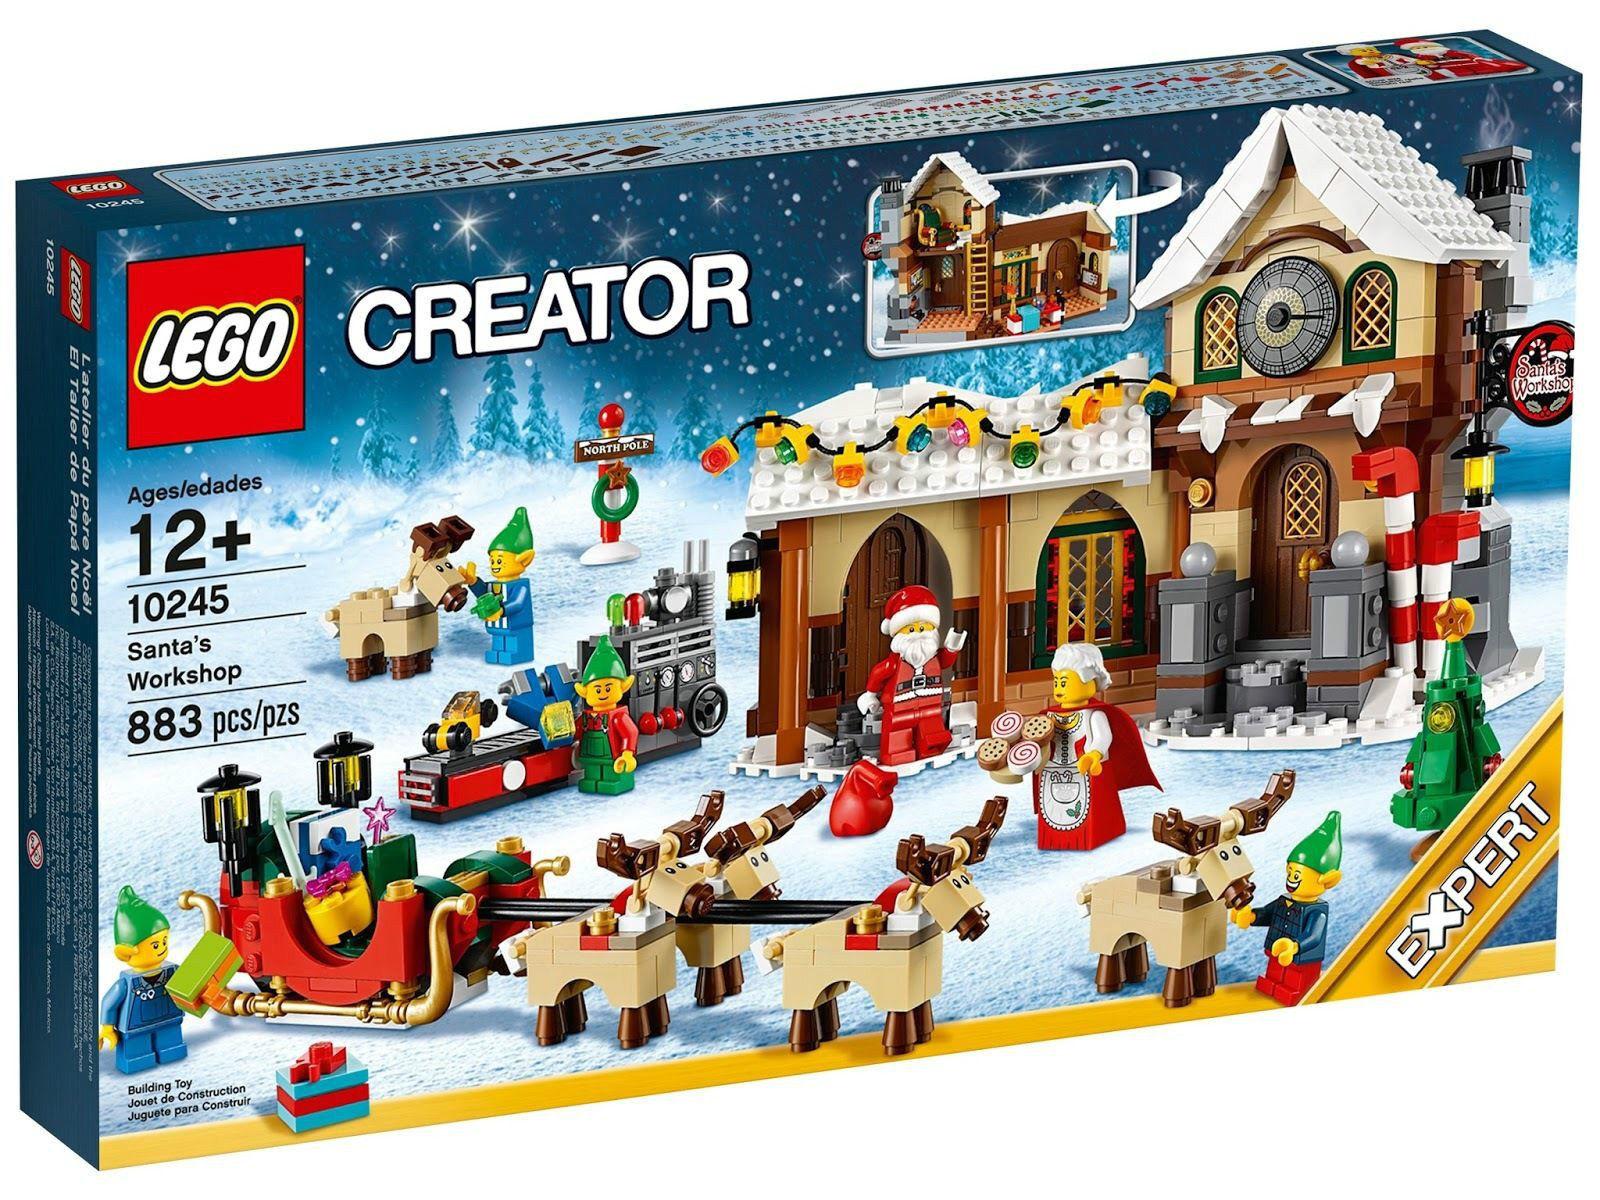 Lego Creator Navidad Santa's Workshop Set 10245